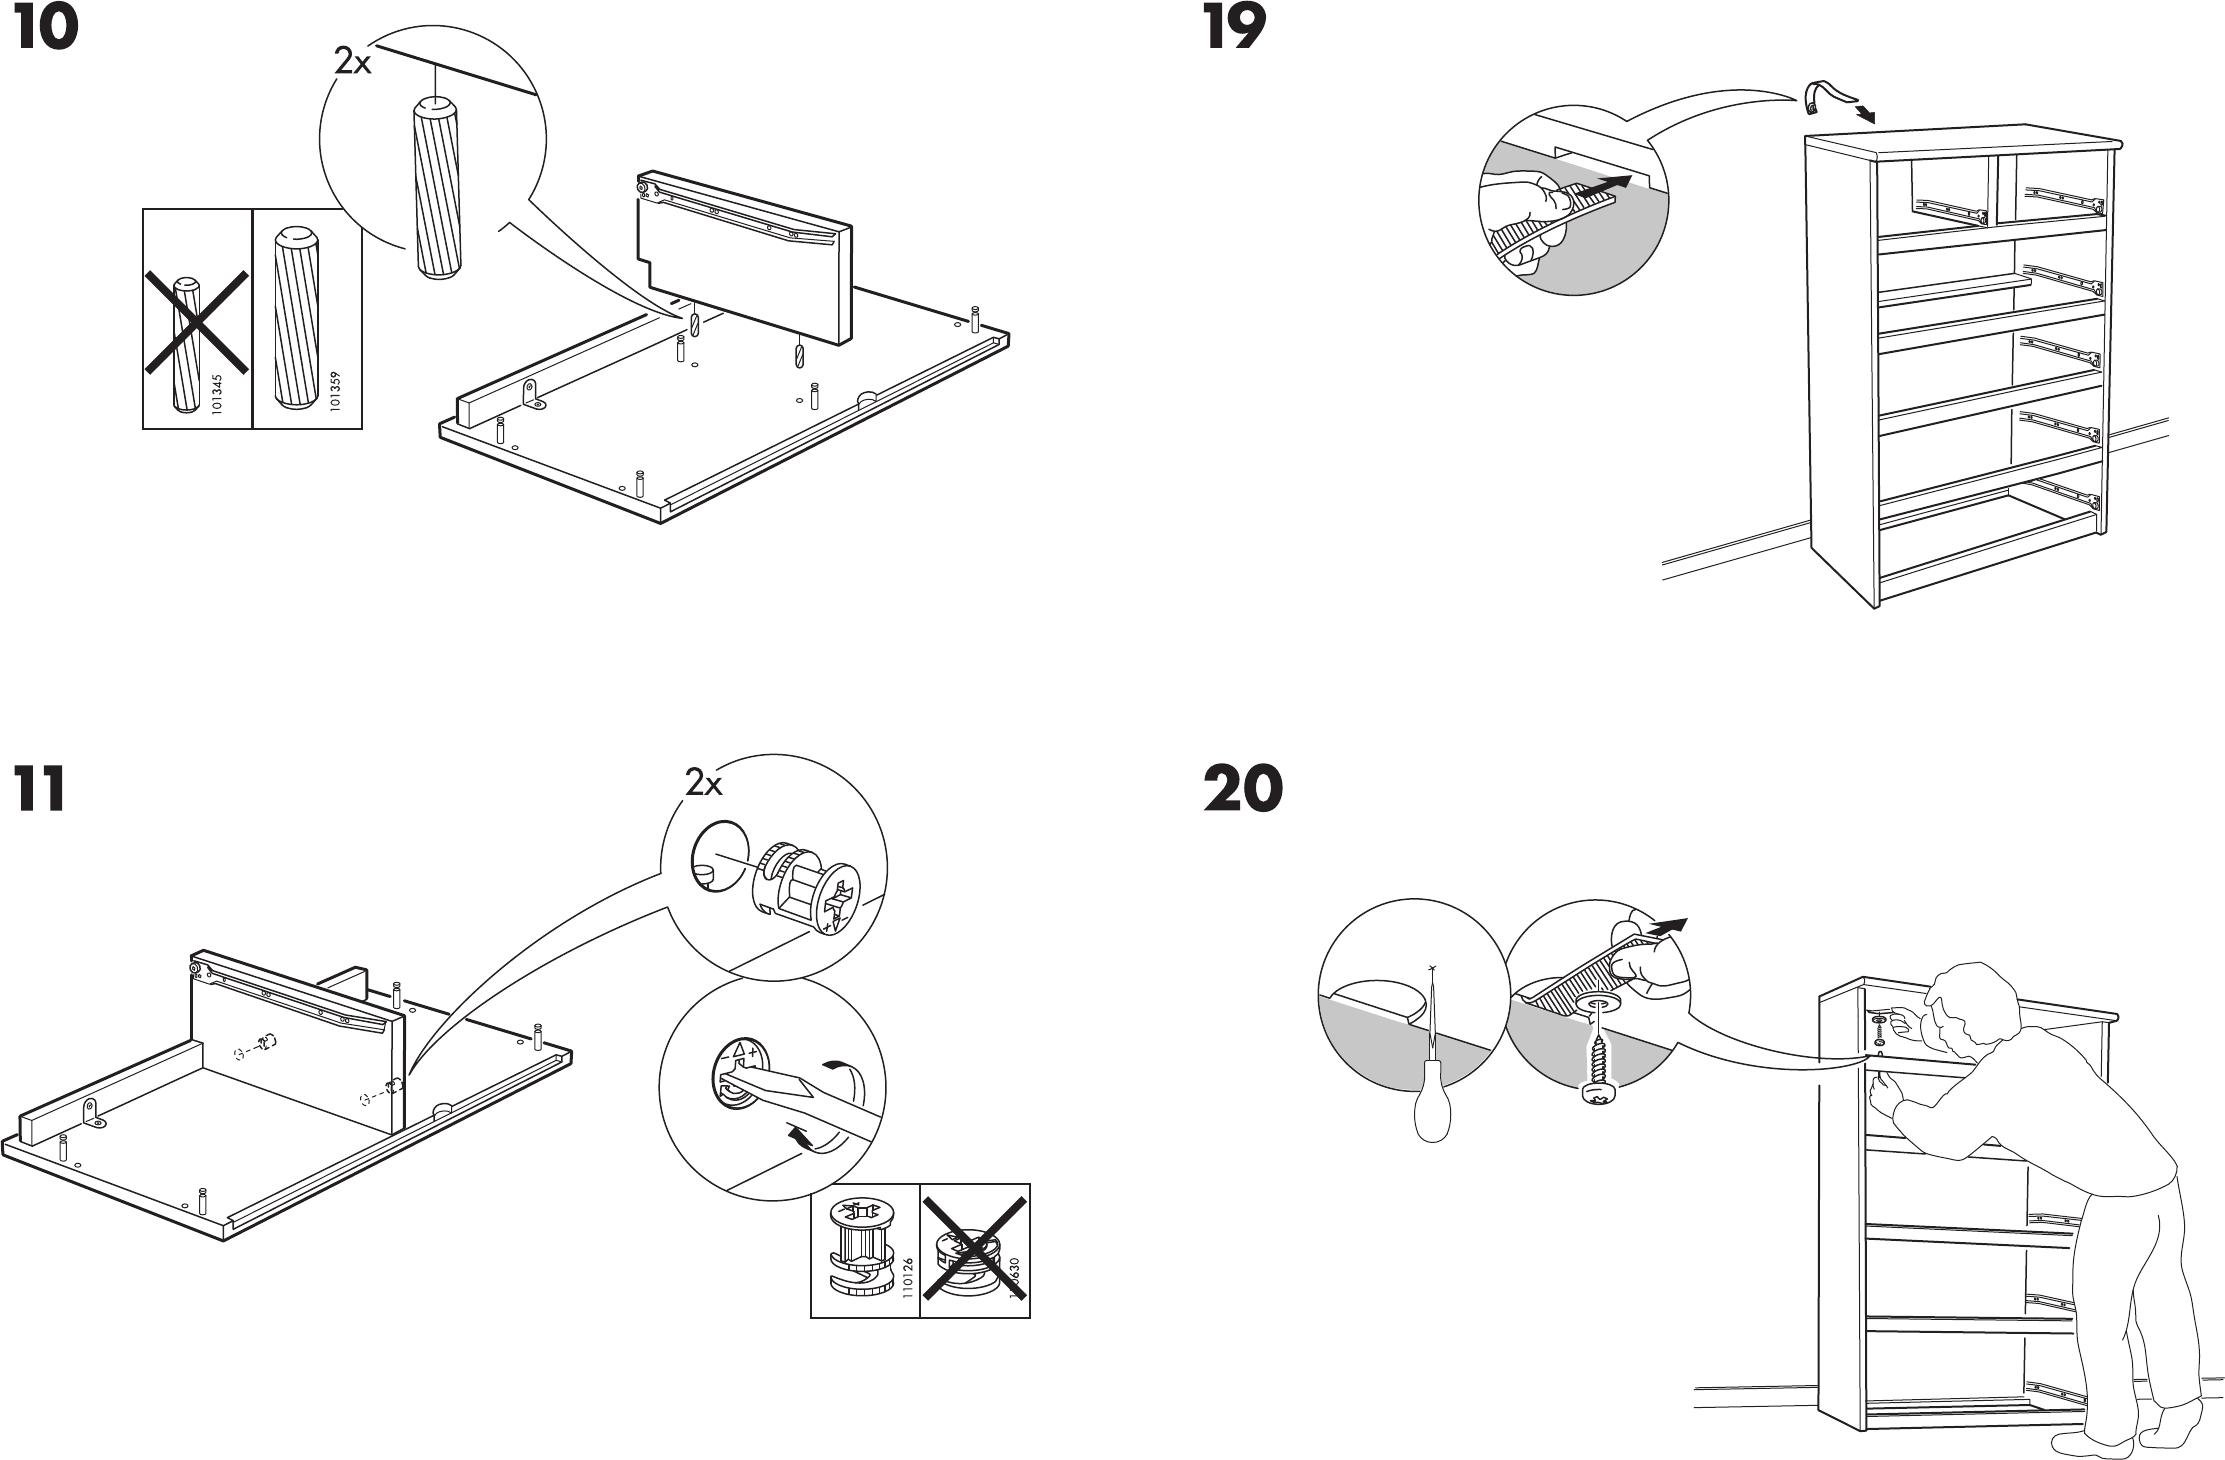 Ikea Malm Ladekast Handleiding.Handleiding Ikea Malm Ladekast 6 Pagina 1 Van 10 Dansk